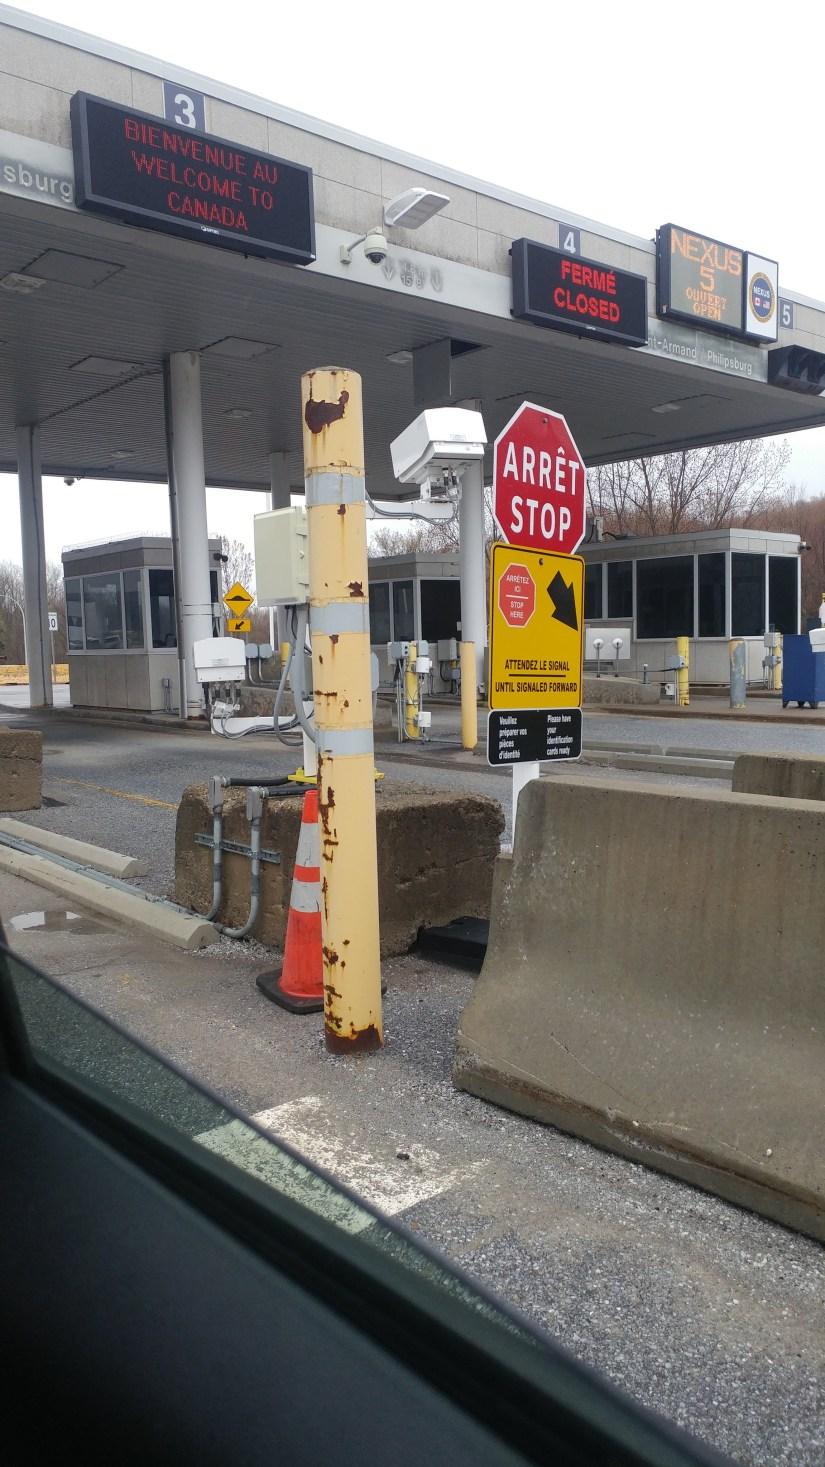 US- Canada border. Stop Arret sign... Unwifedmotherexpletive